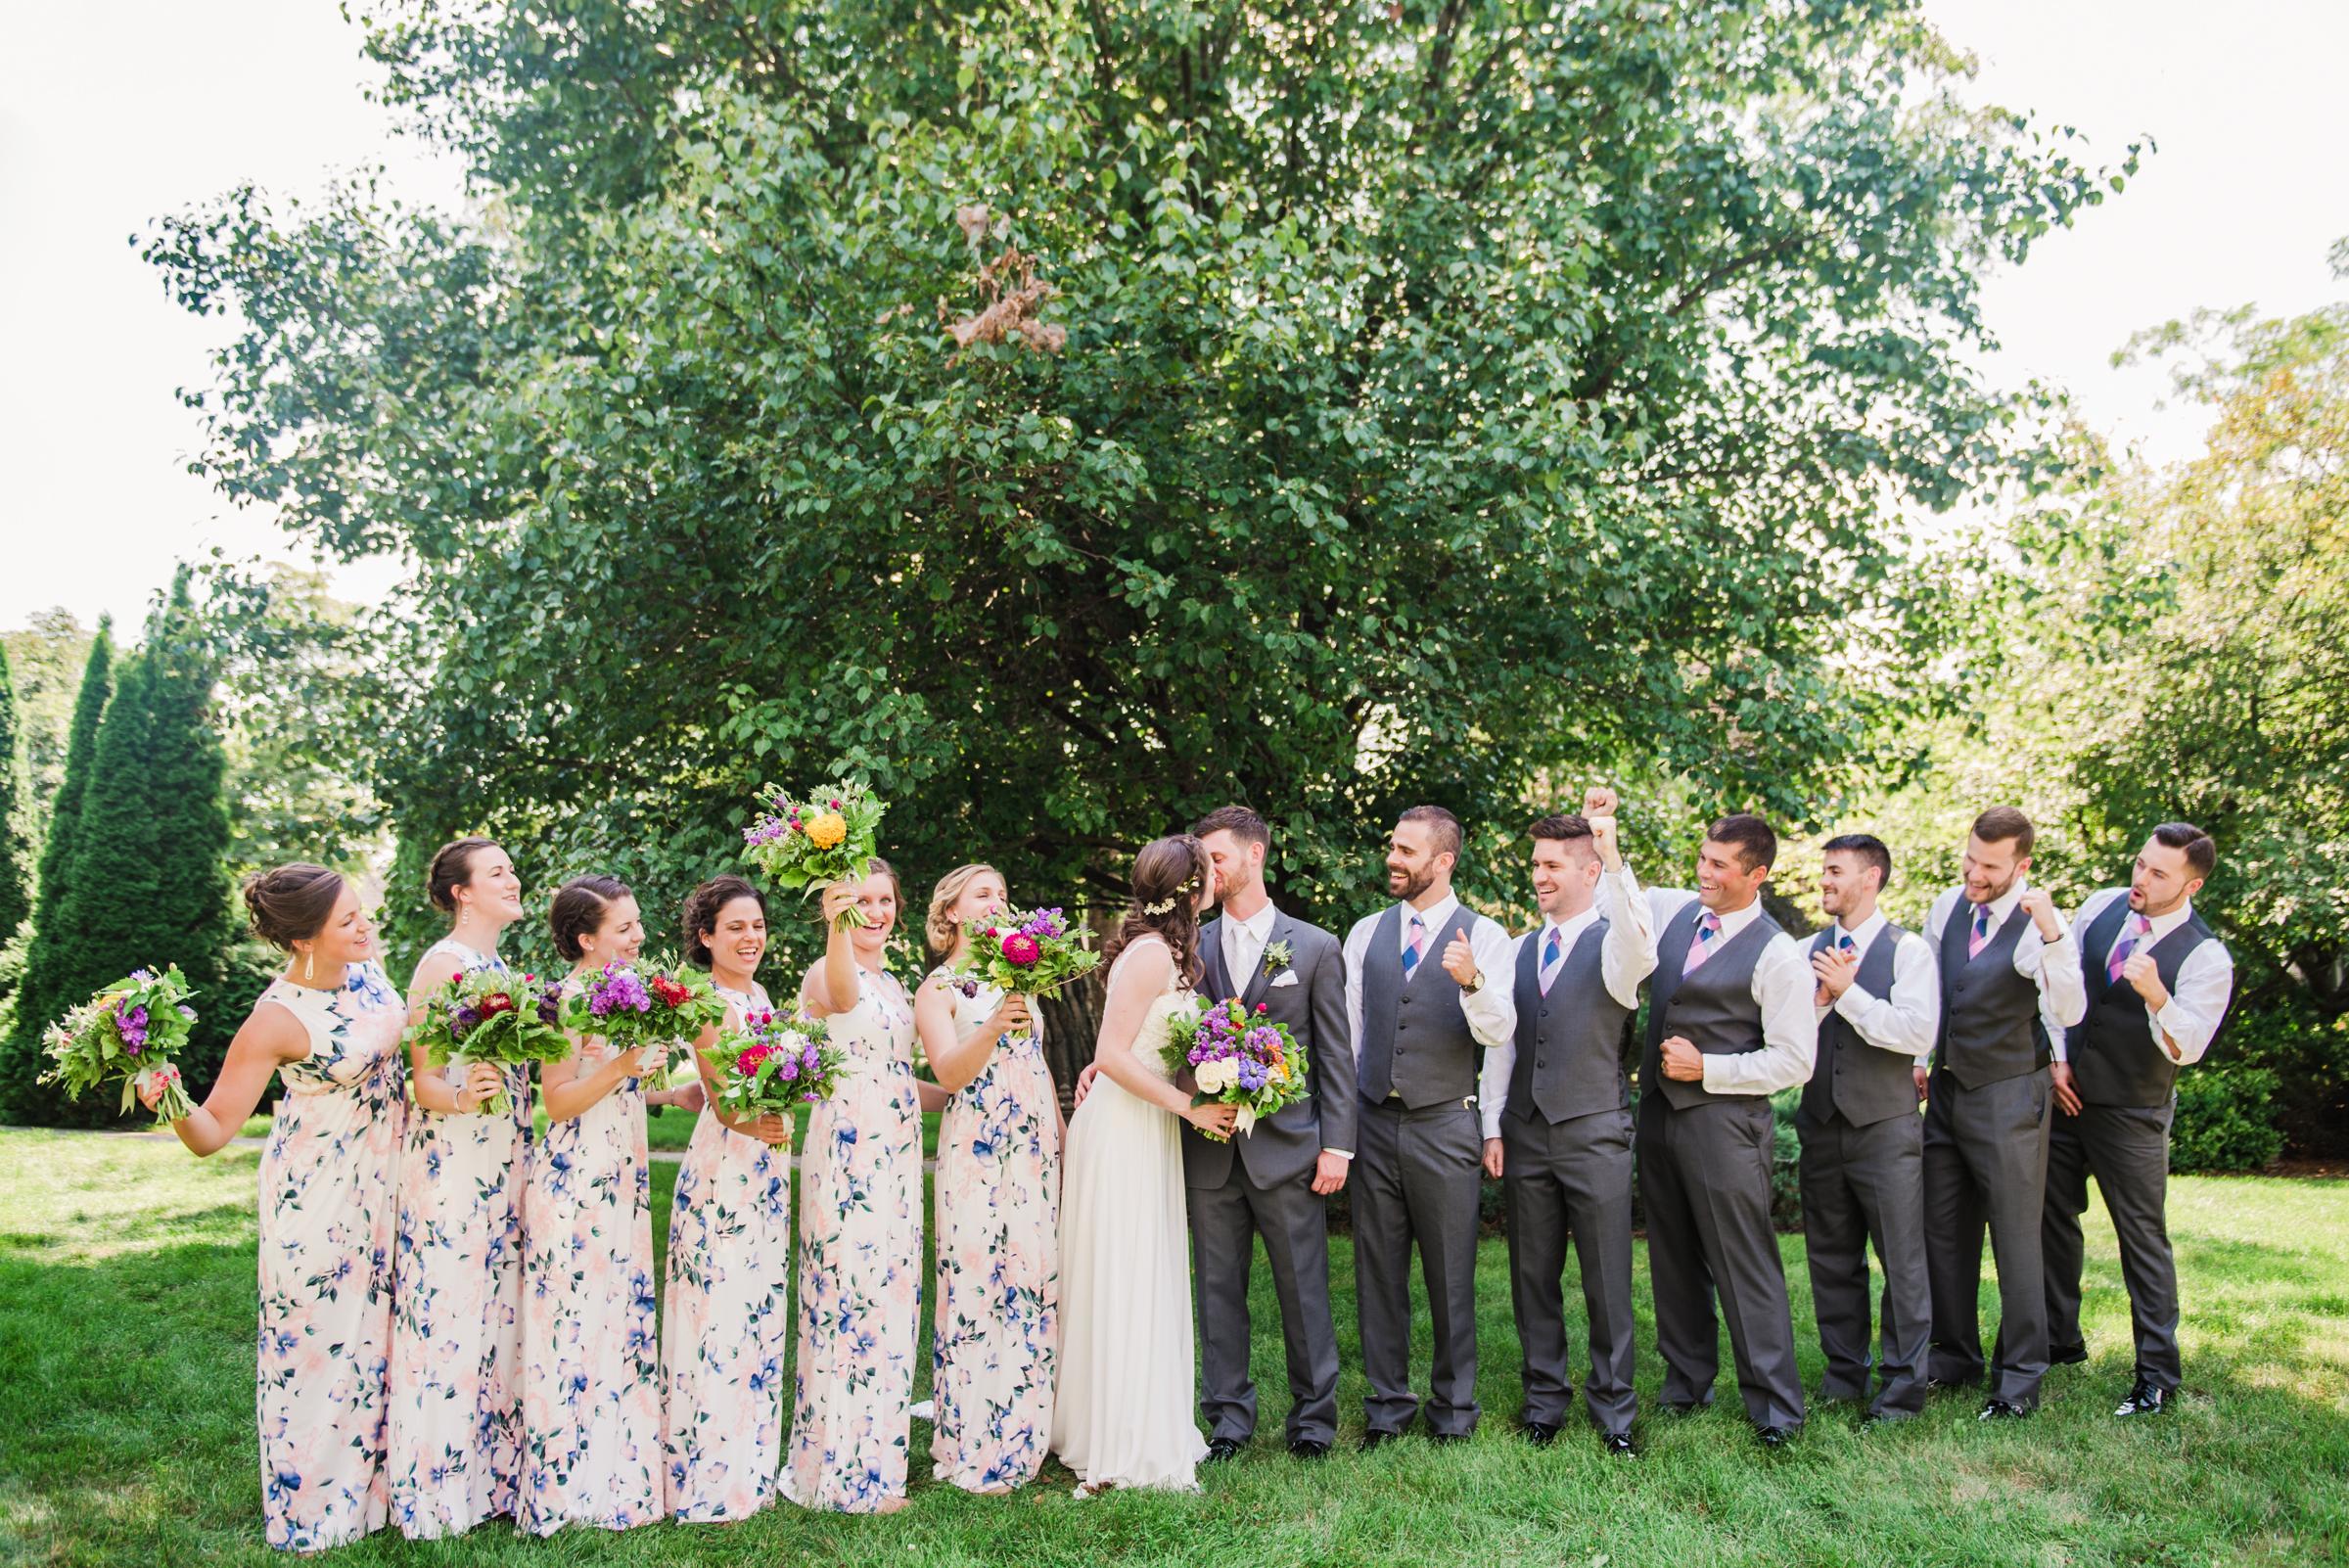 Jerris_Wadsworth_Wedding_Barn_Rochester_Wedding_JILL_STUDIO_Rochester_NY_Photographer_DSC_2307.jpg